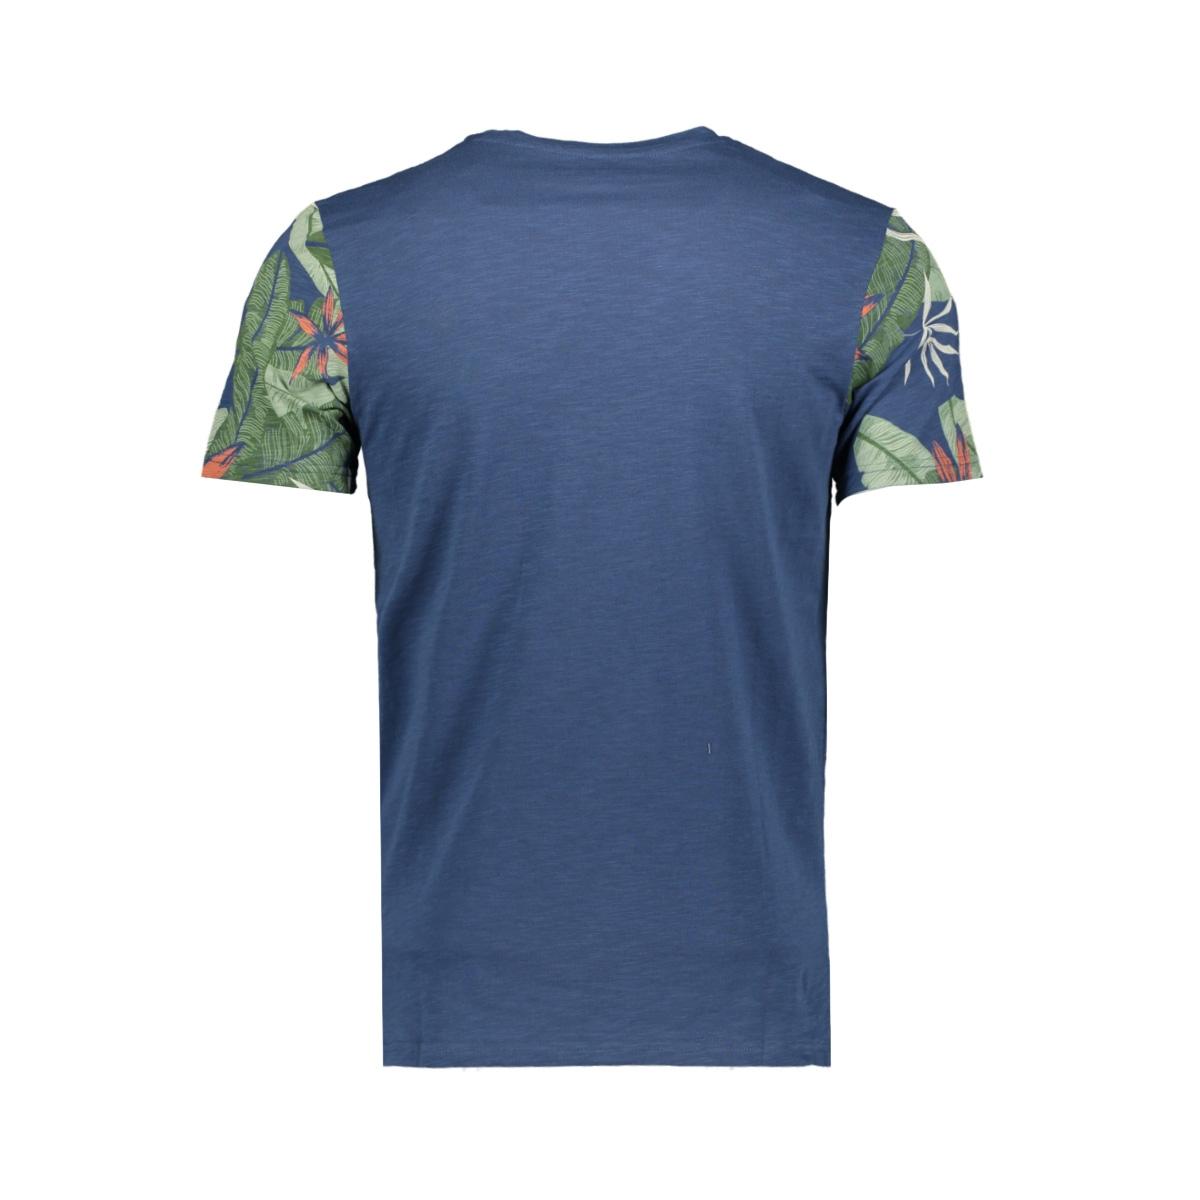 jornewolympia tee ss crew neck 12160833 jack & jones t-shirt dark denim/slim